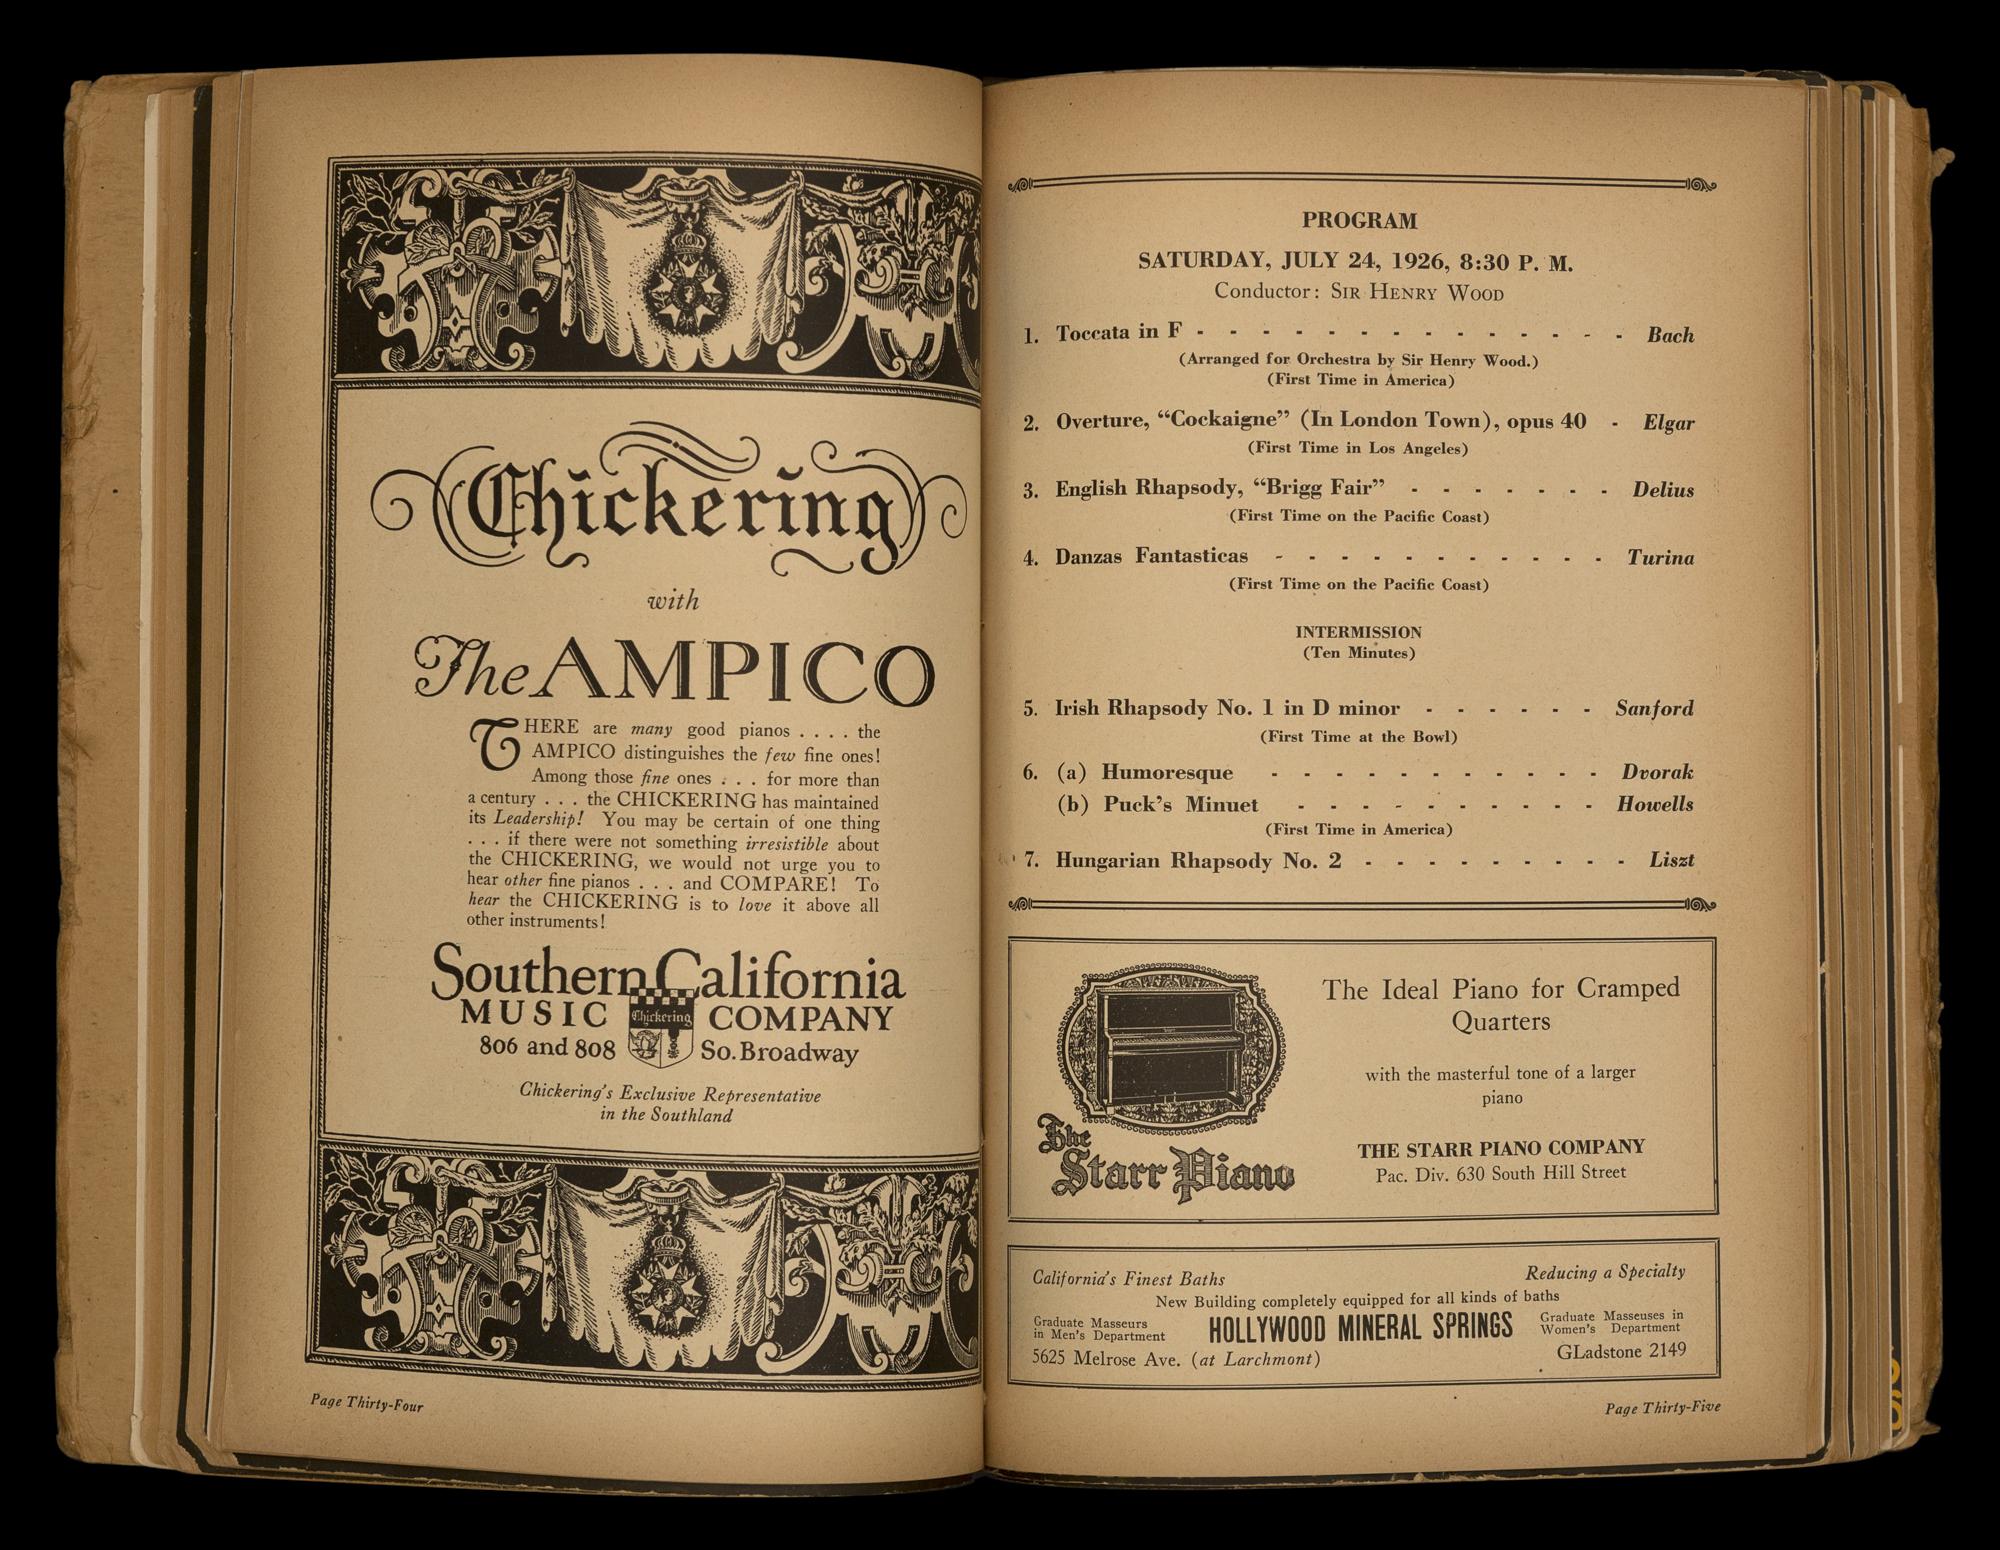 HB_ProgramBook_PageC_1926.jpg